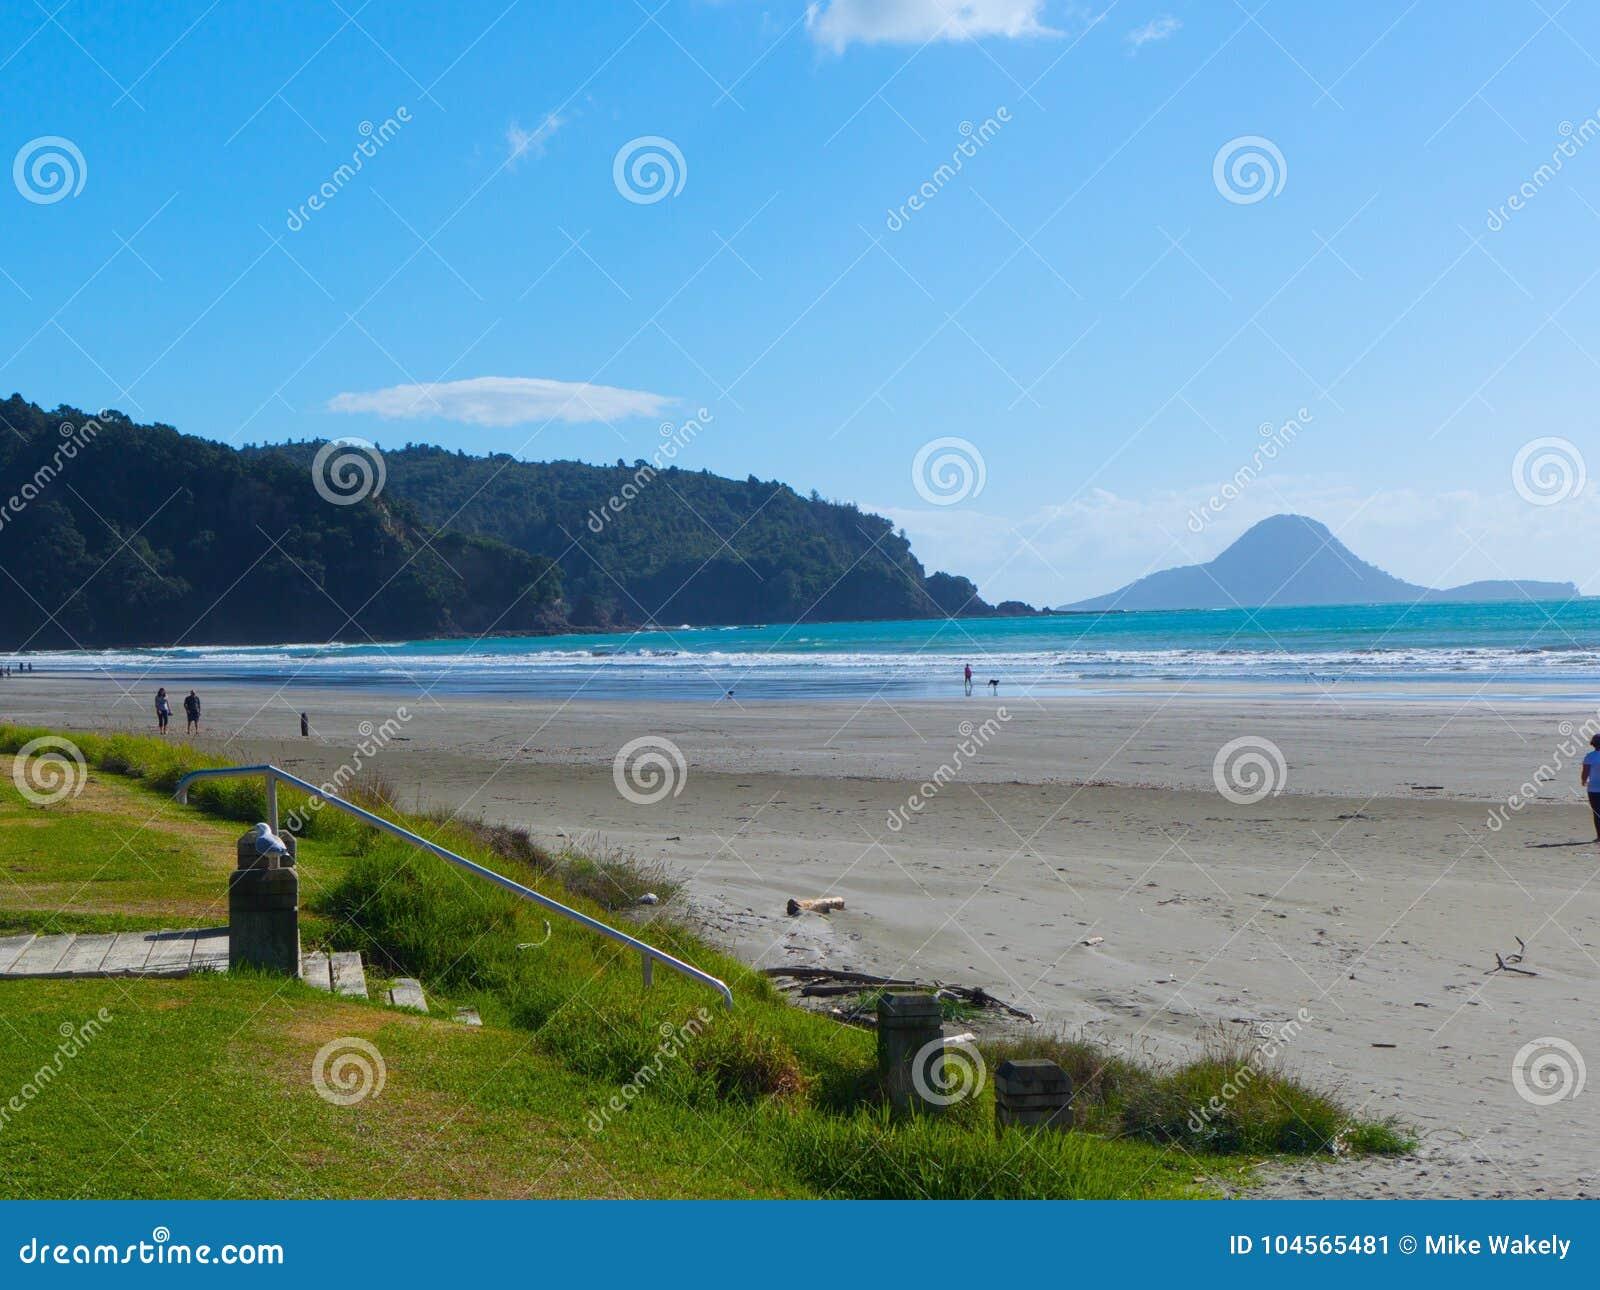 Beach scene New Zealand